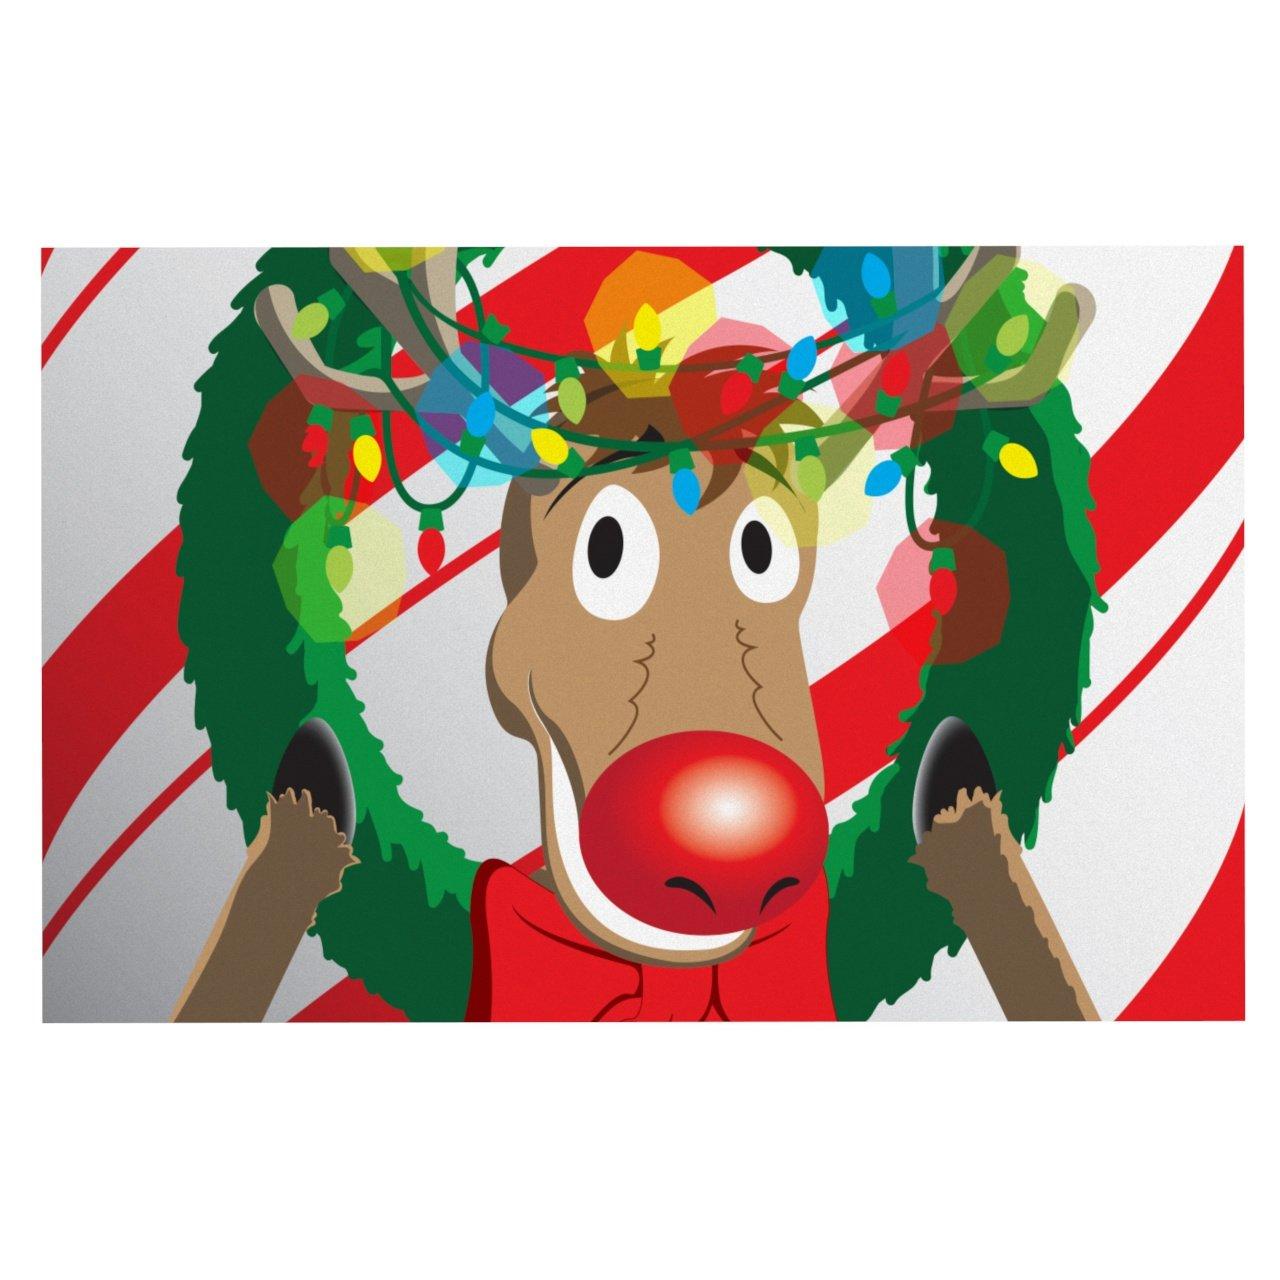 KESS InHouse KIH117ADM02 Kess Original Reindeer Seasonal Dog Place Mat, 24  x 15